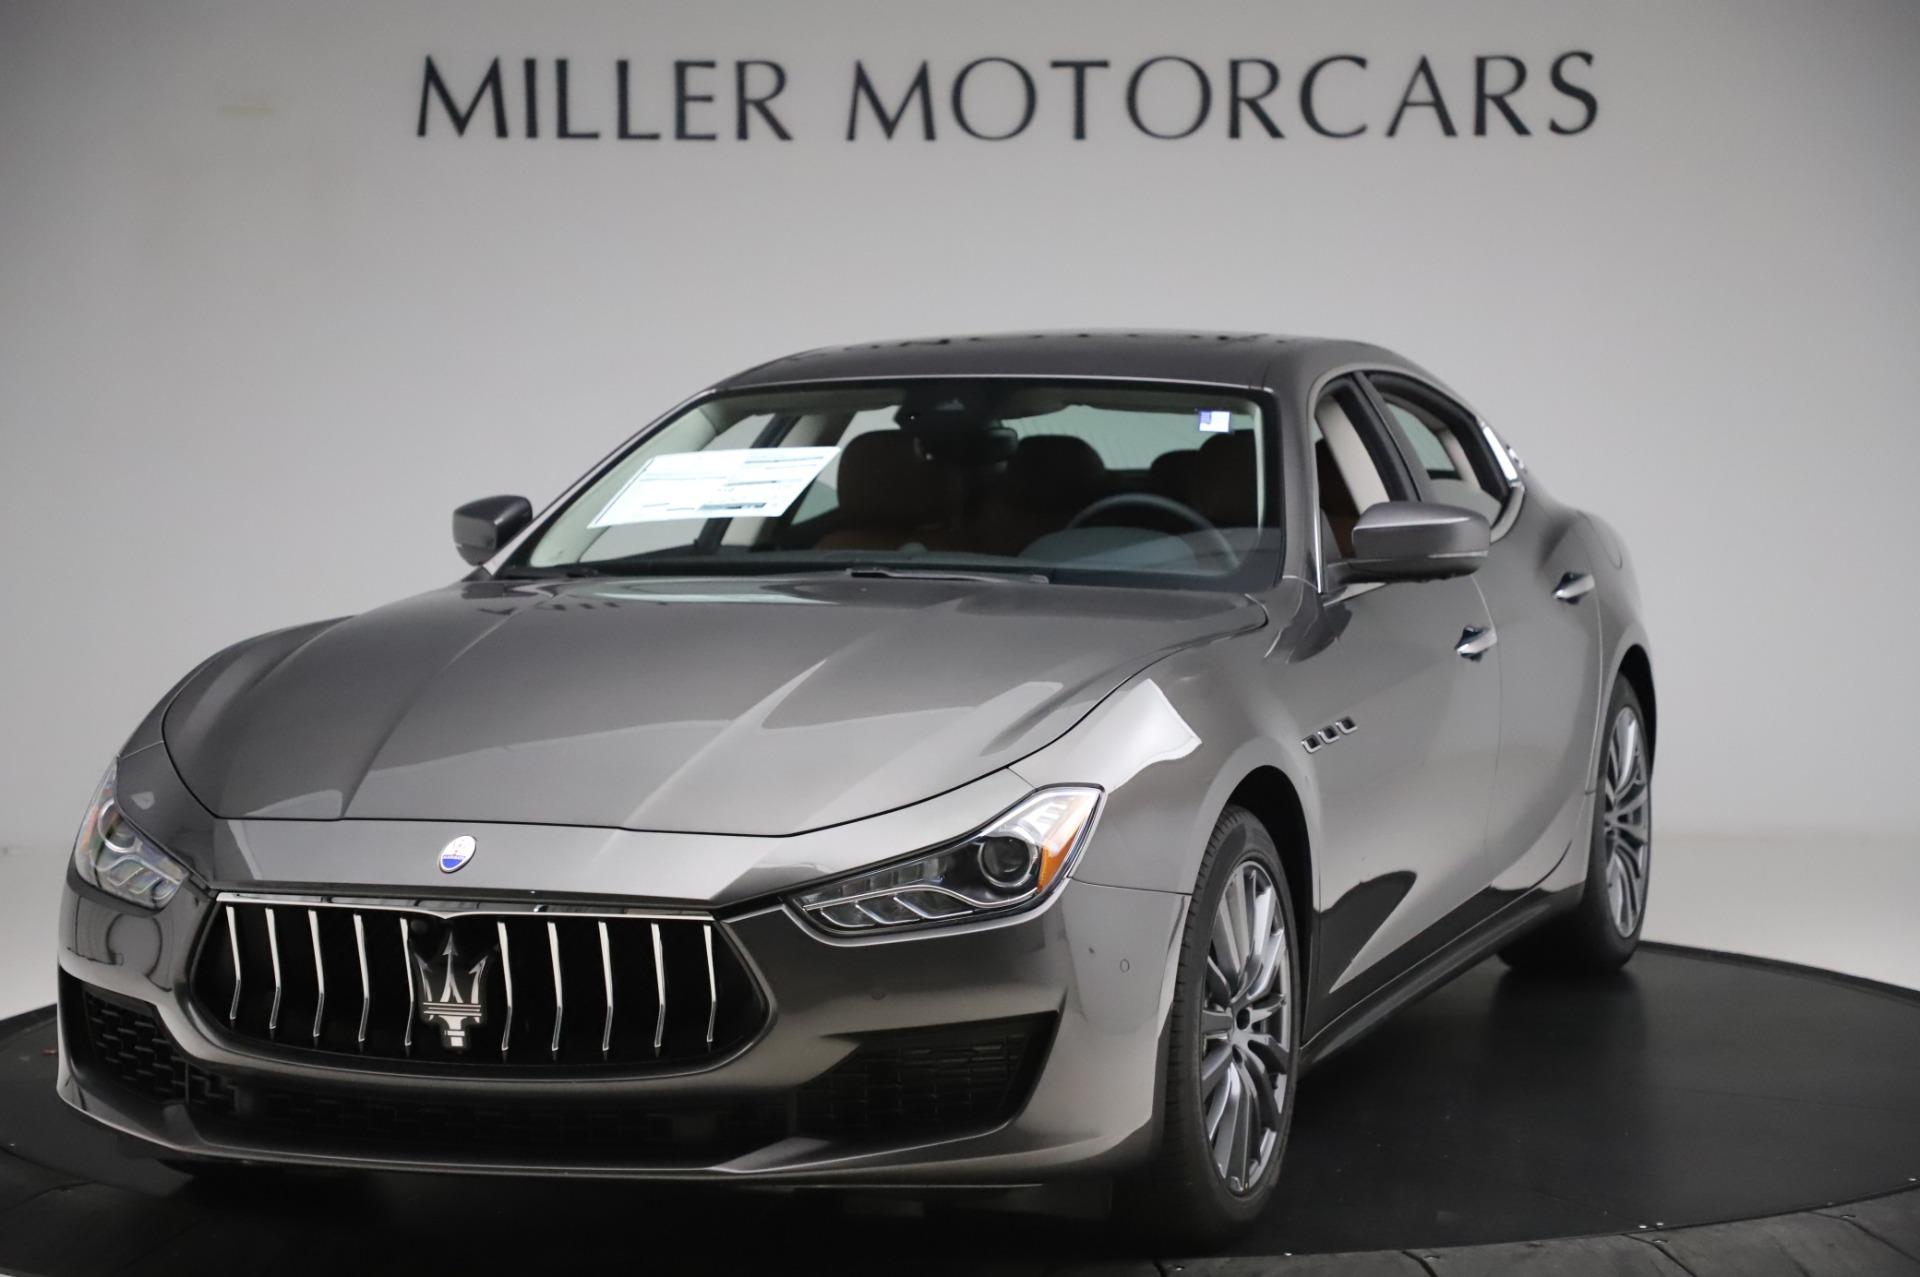 New 2020 Maserati Ghibli S Q4 for sale $83,785 at Pagani of Greenwich in Greenwich CT 06830 1